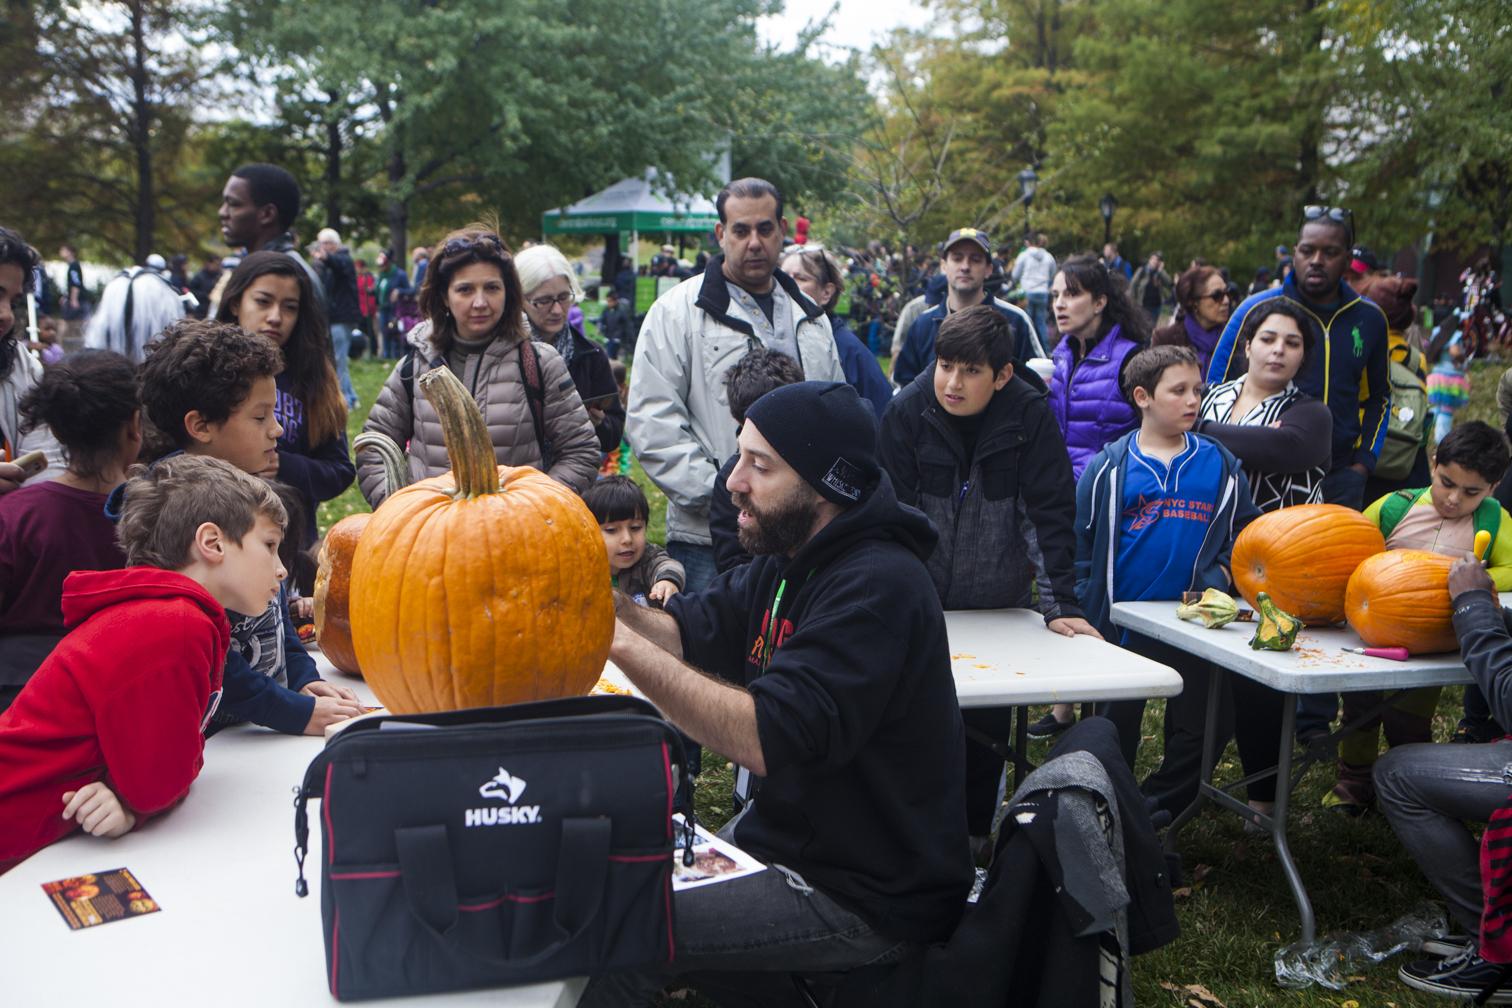 Marc carving in Central Park (photo credit: Lauren Gesswein)